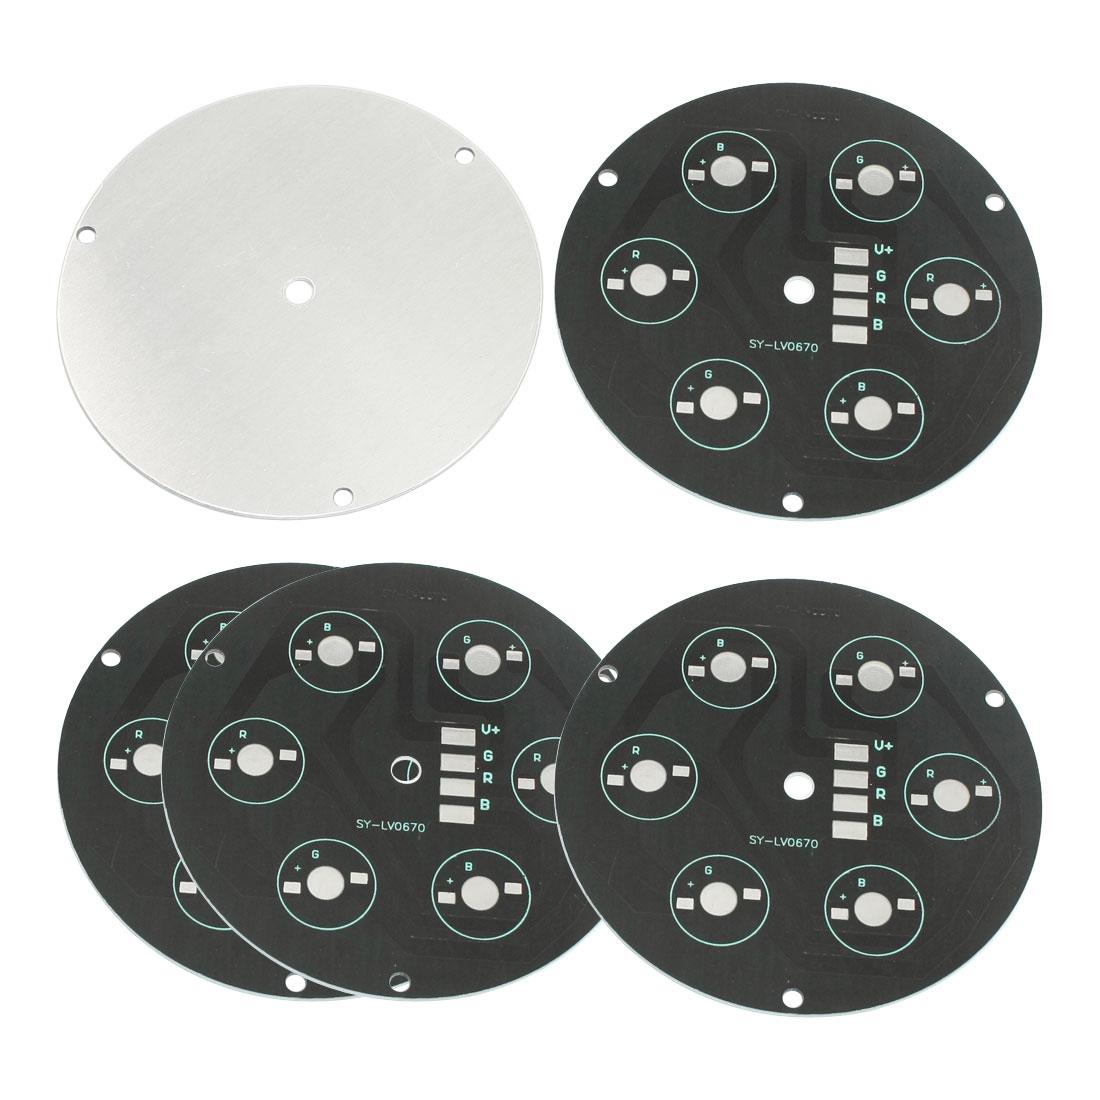 5 PCS 10cm Diameter 7.9cm Hole Distance Circle Aluminum PCB Circuit Board for 6 x 1W/3W/5W High Power RGB LEDs Bulb